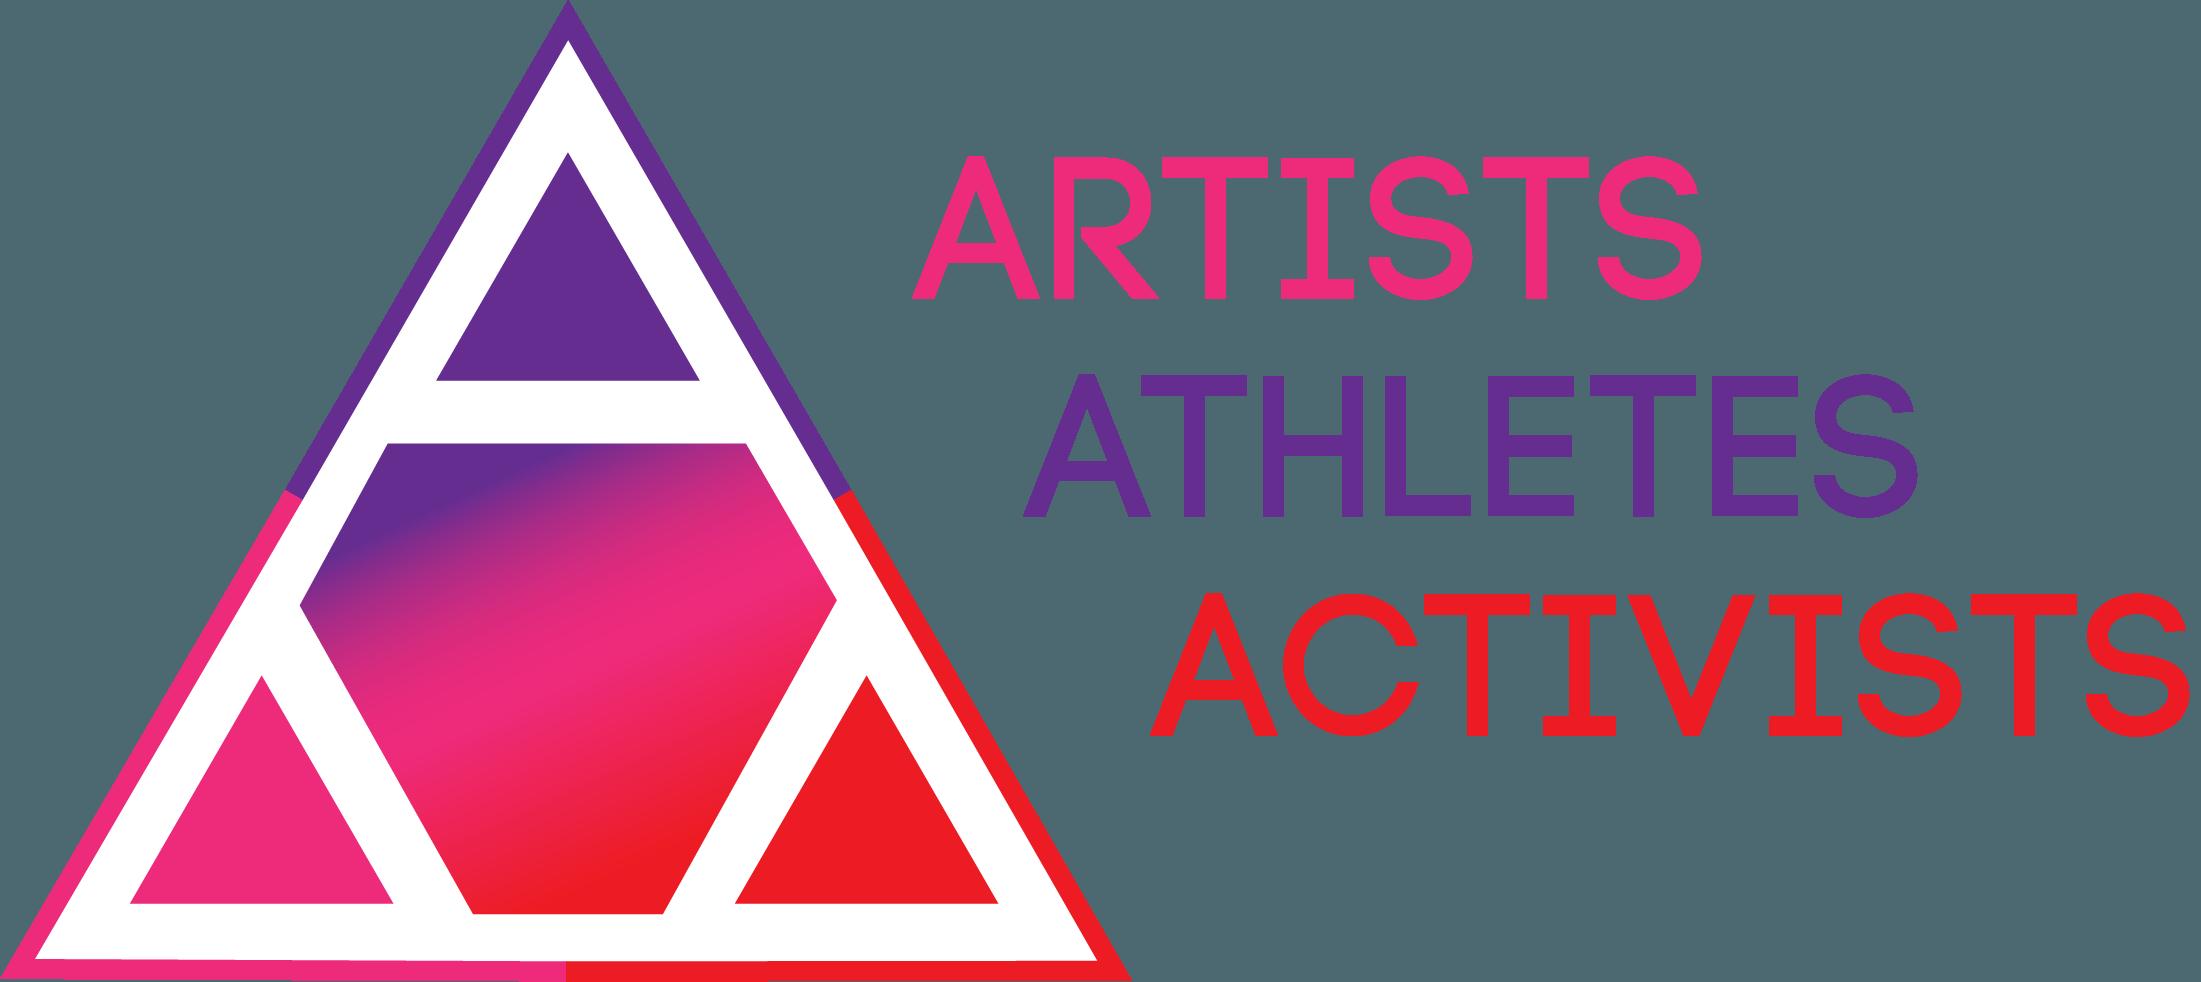 Artists-Athletes-Activists